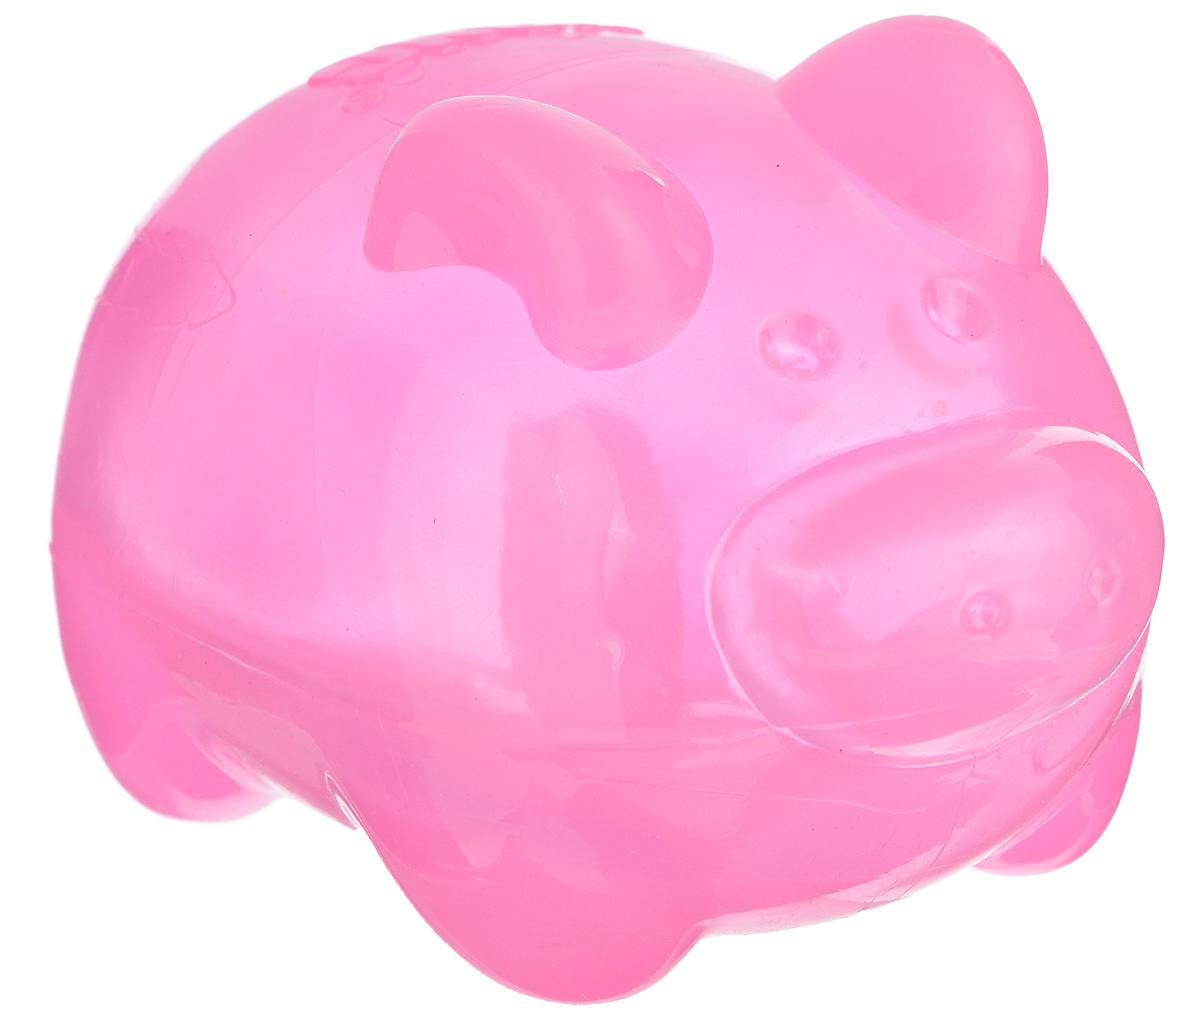 Игрушка для собак Kong Сквиз Джелс. Свинка, с пищалкой, цвет: розовый, 6 см х 6 см х 9,5 см игрушка для собак kong регби с пищалкой цвет прозрачный фиолетовый 18 х 9 х 9 см